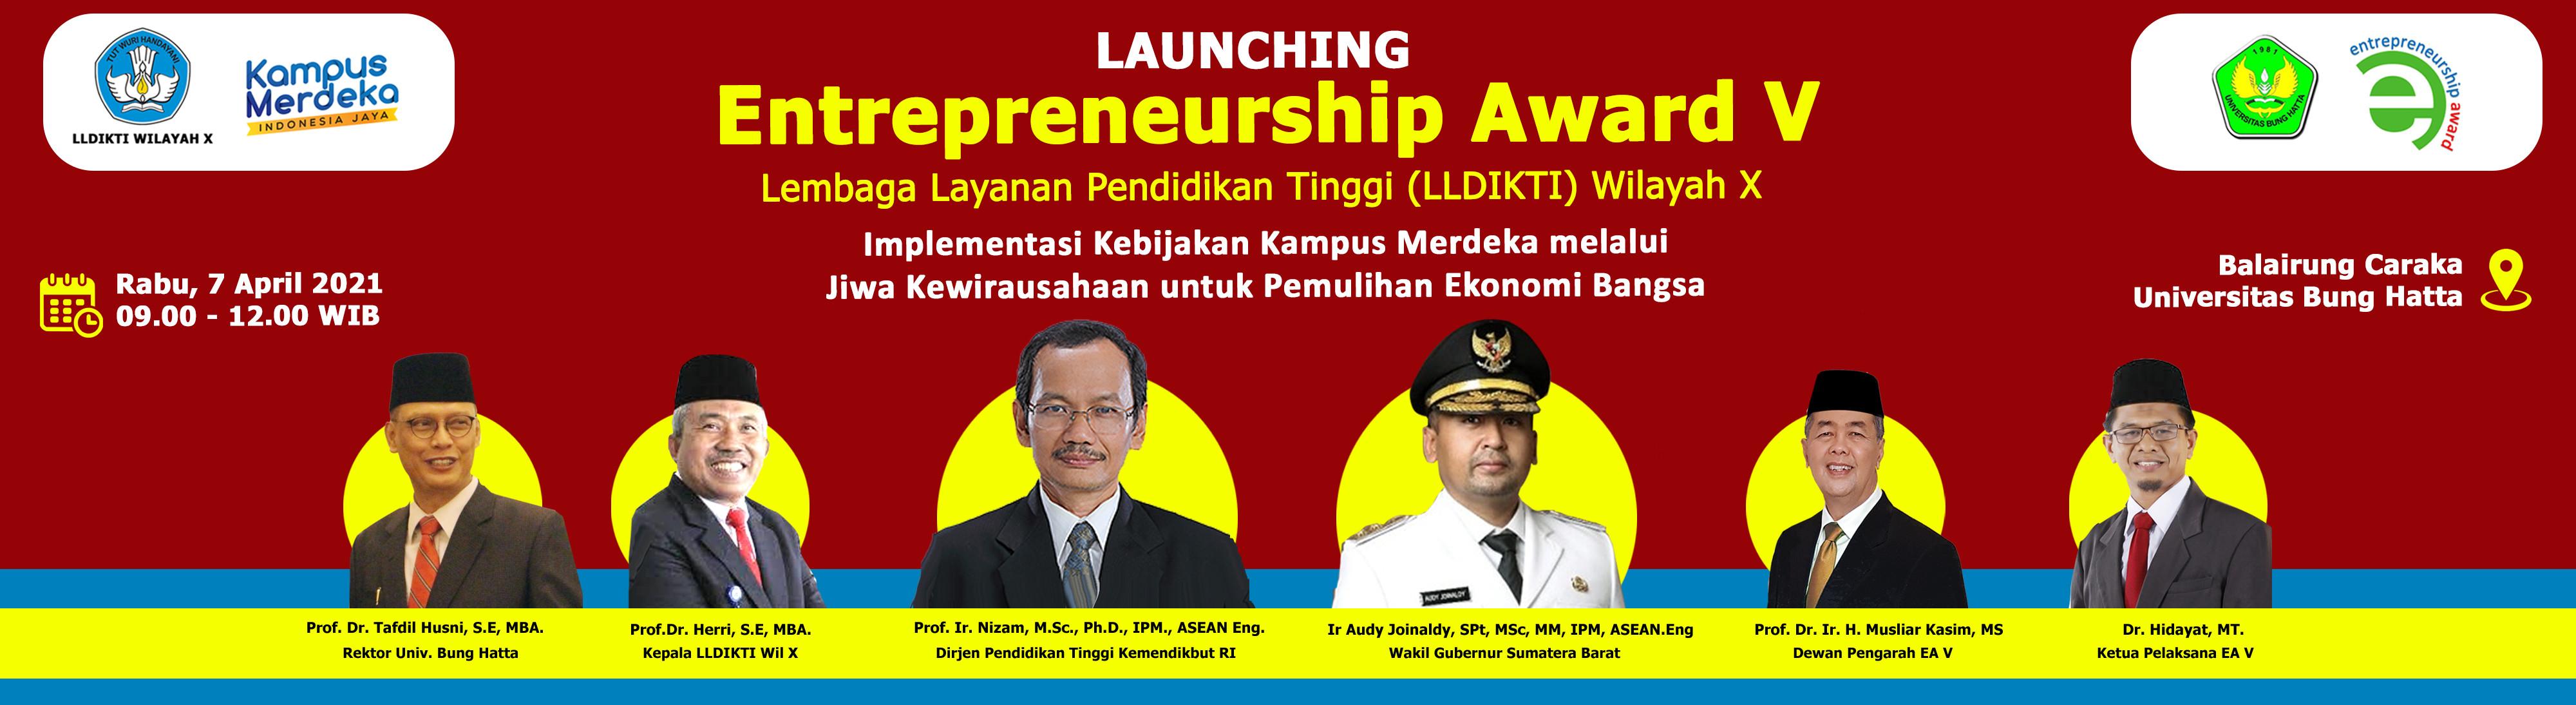 Spanduk_Entrepenureship_Award_V_2021.jpg